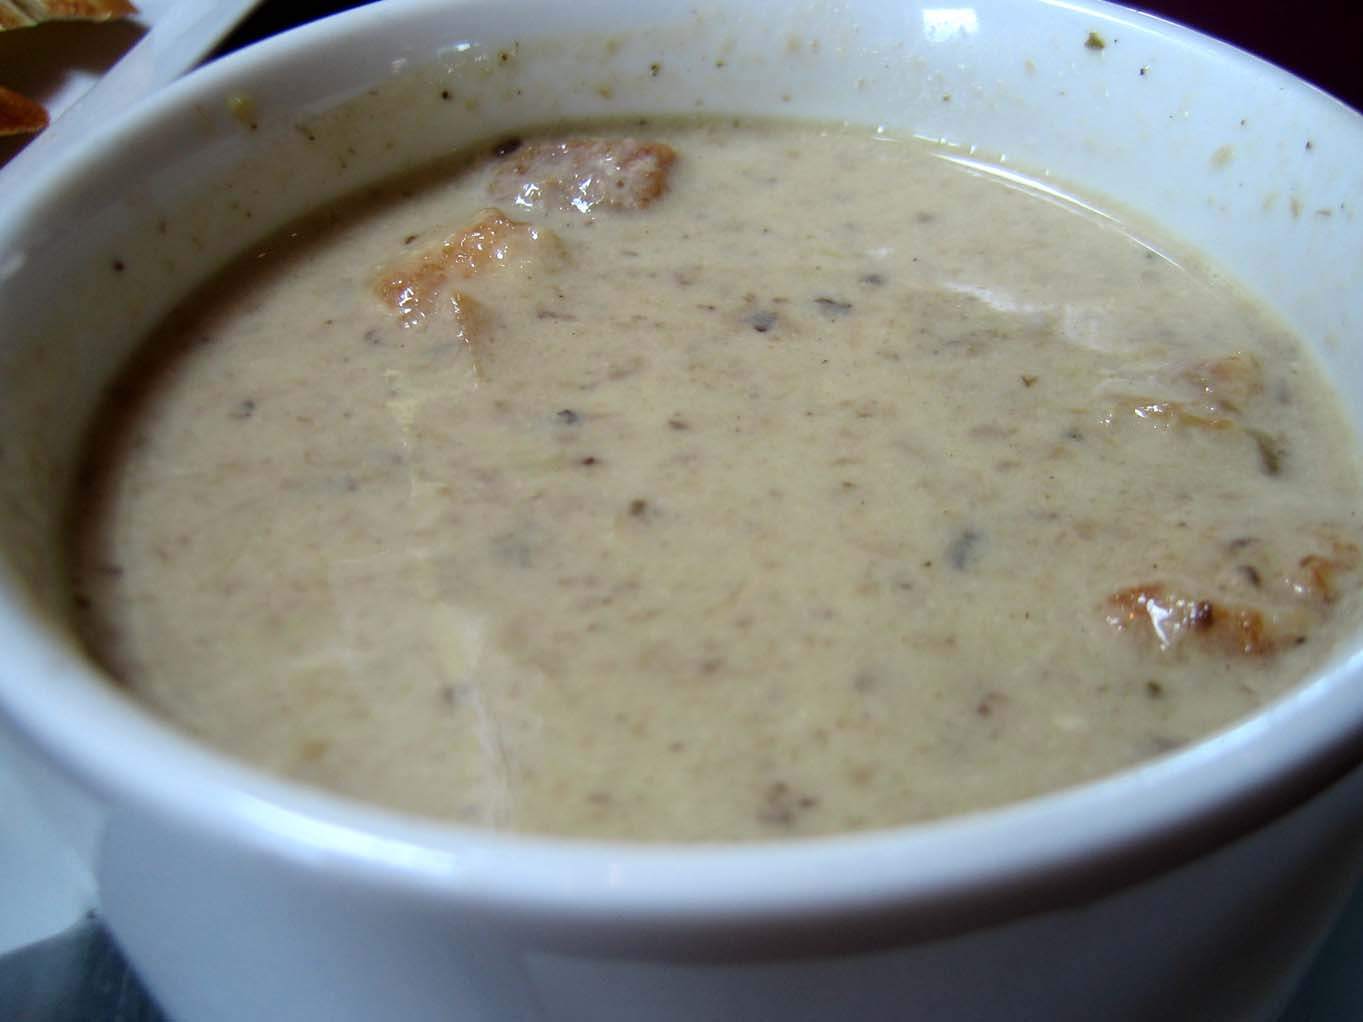 Mizi Mushroom soup